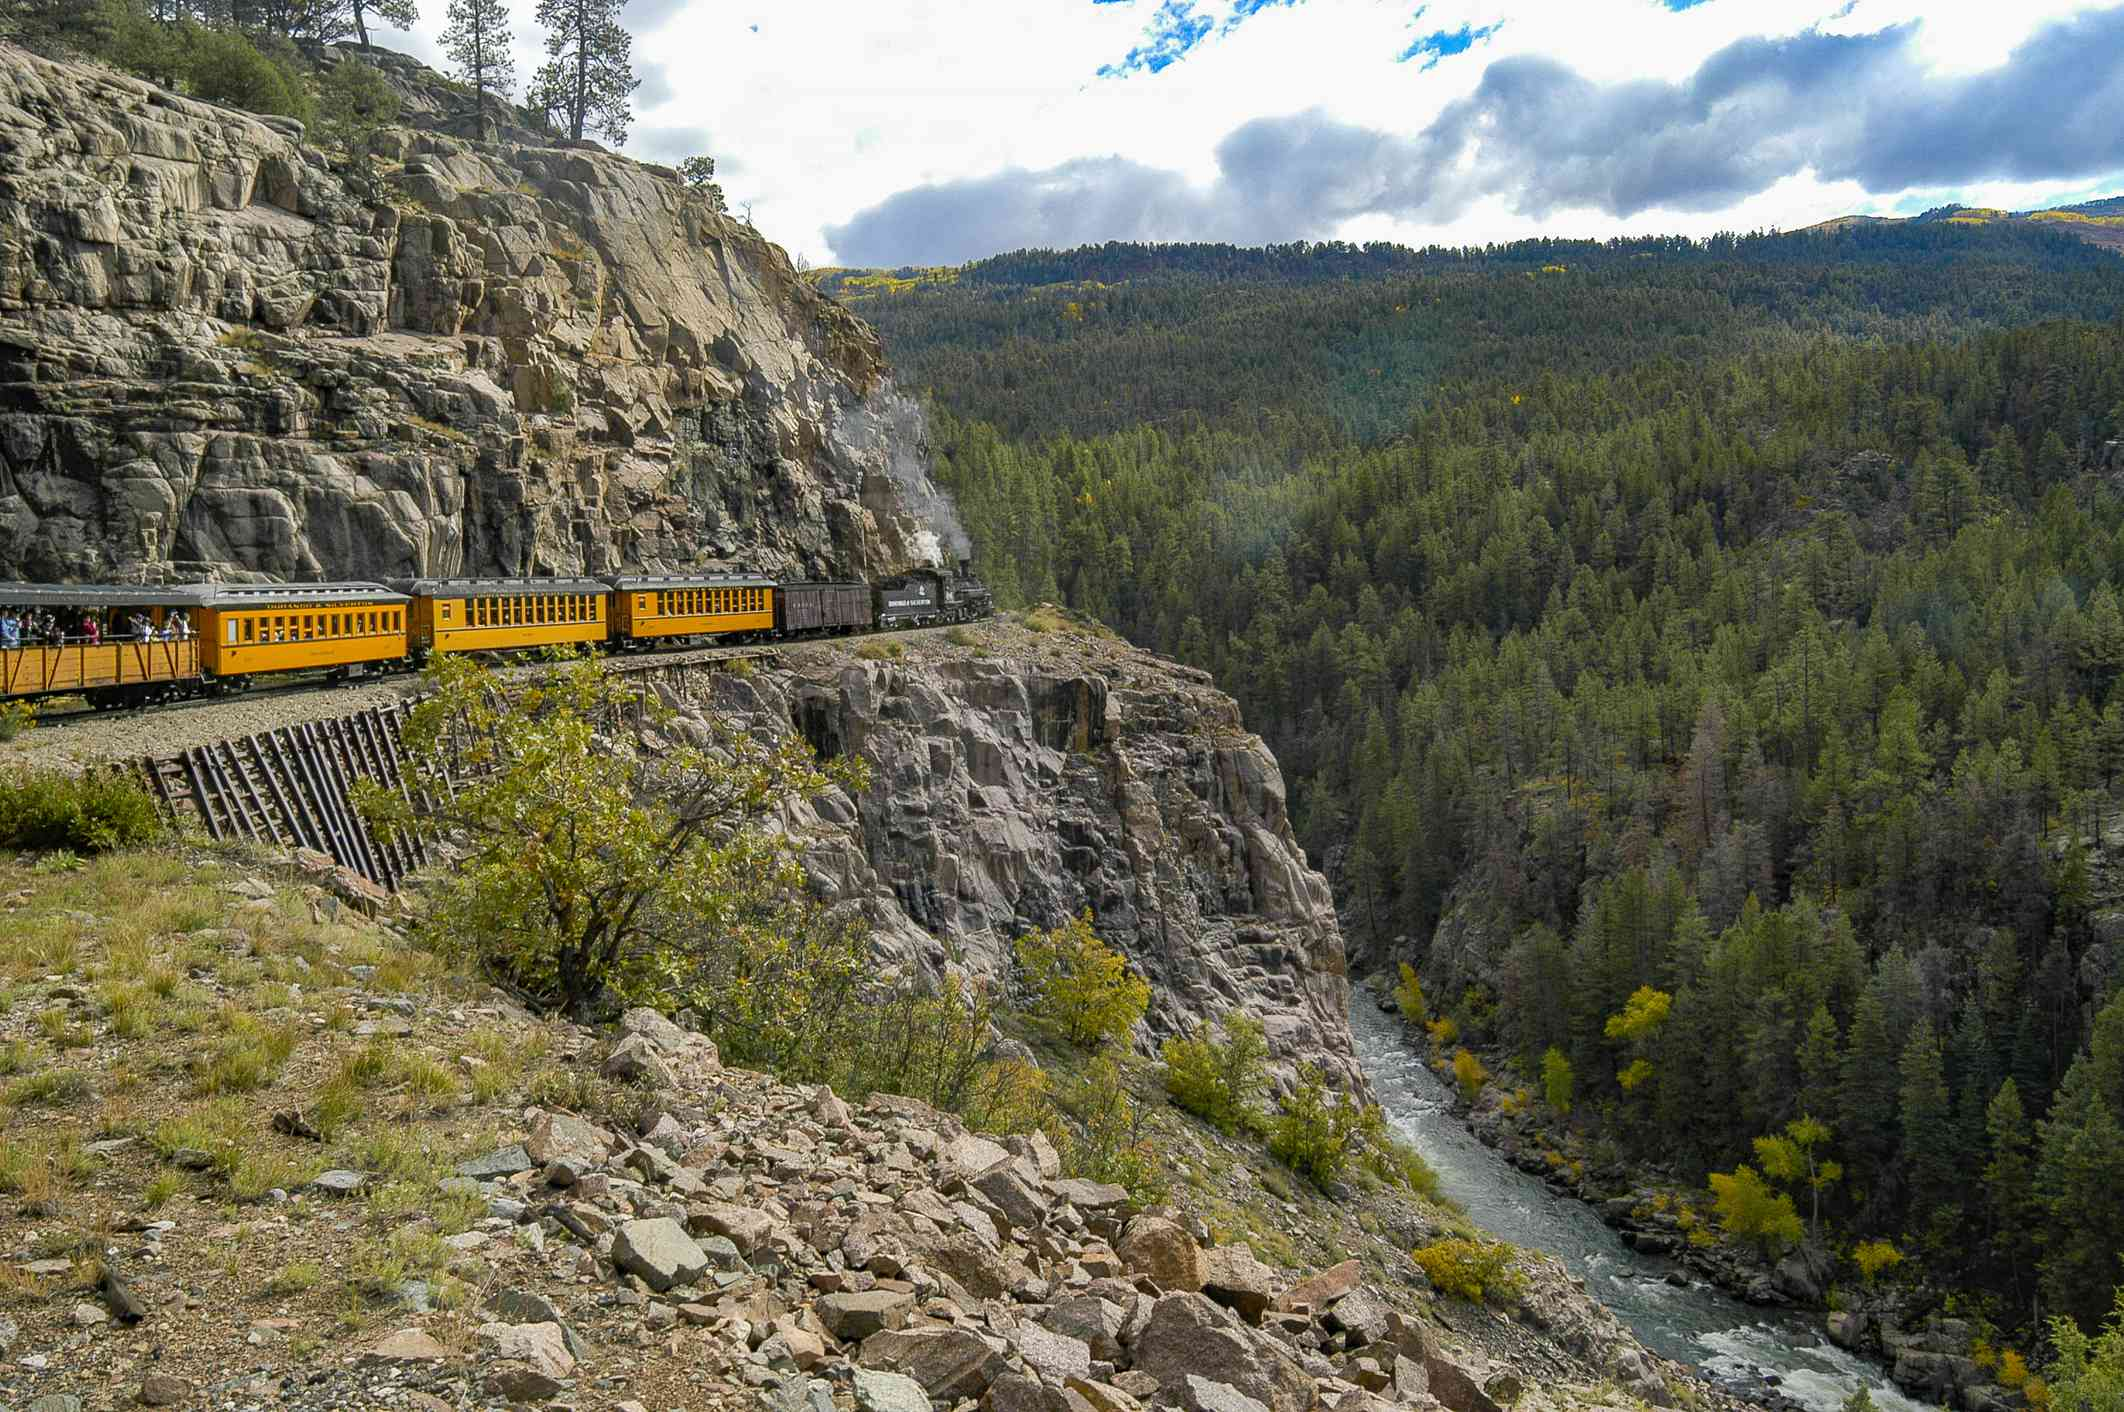 Durango and Silverton train traveling through the maountains